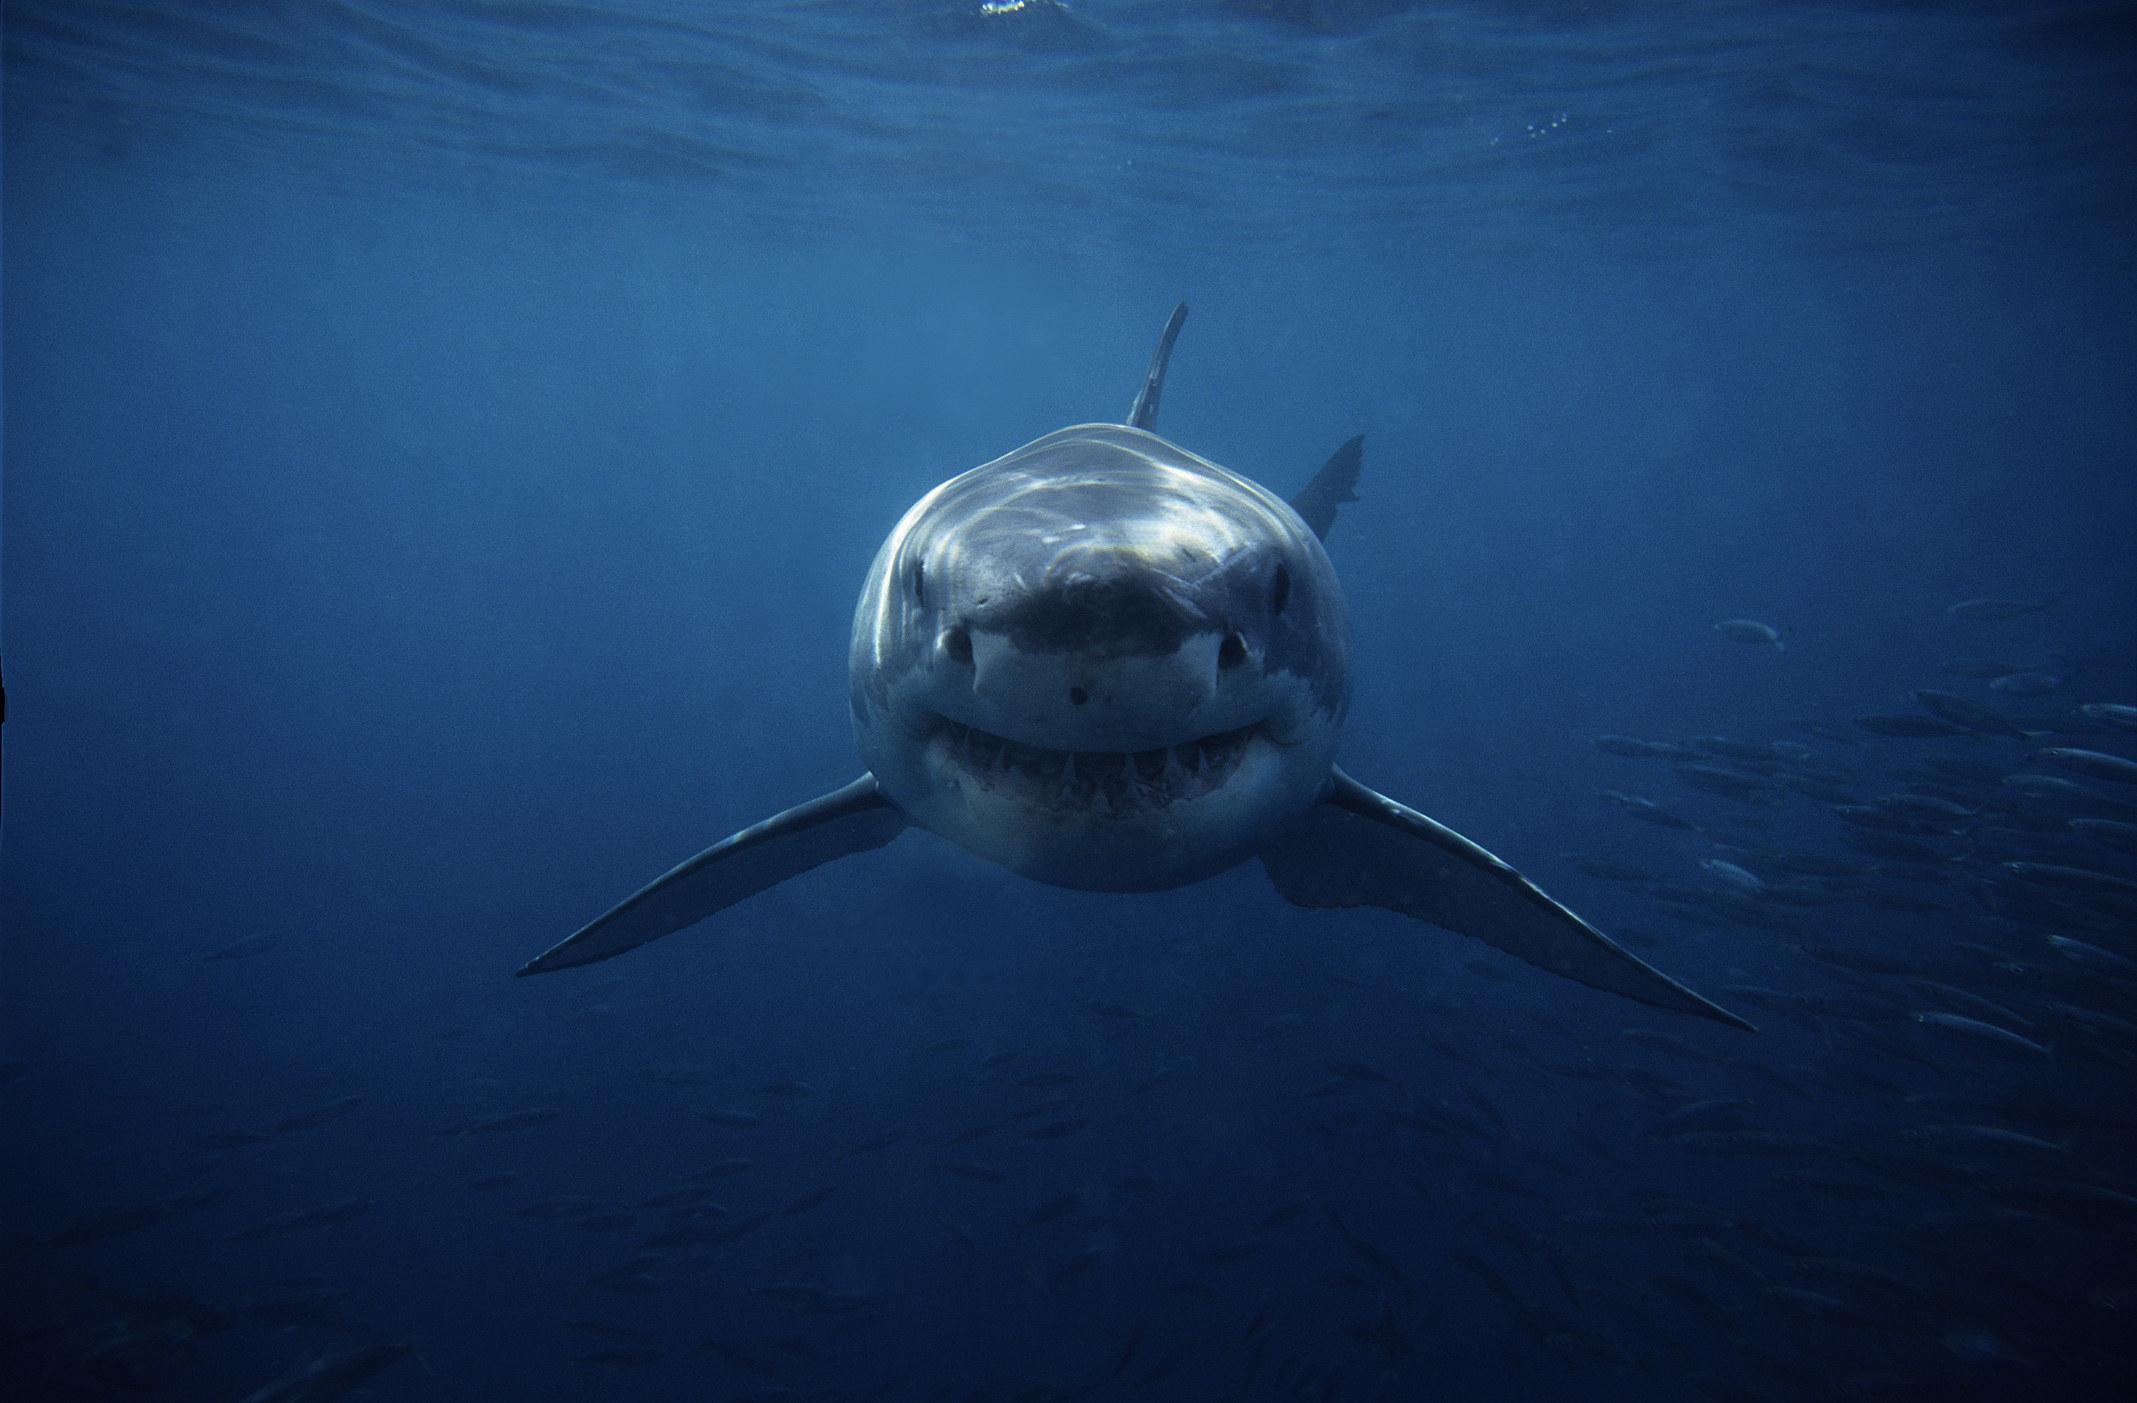 A shark swimming toward the camera